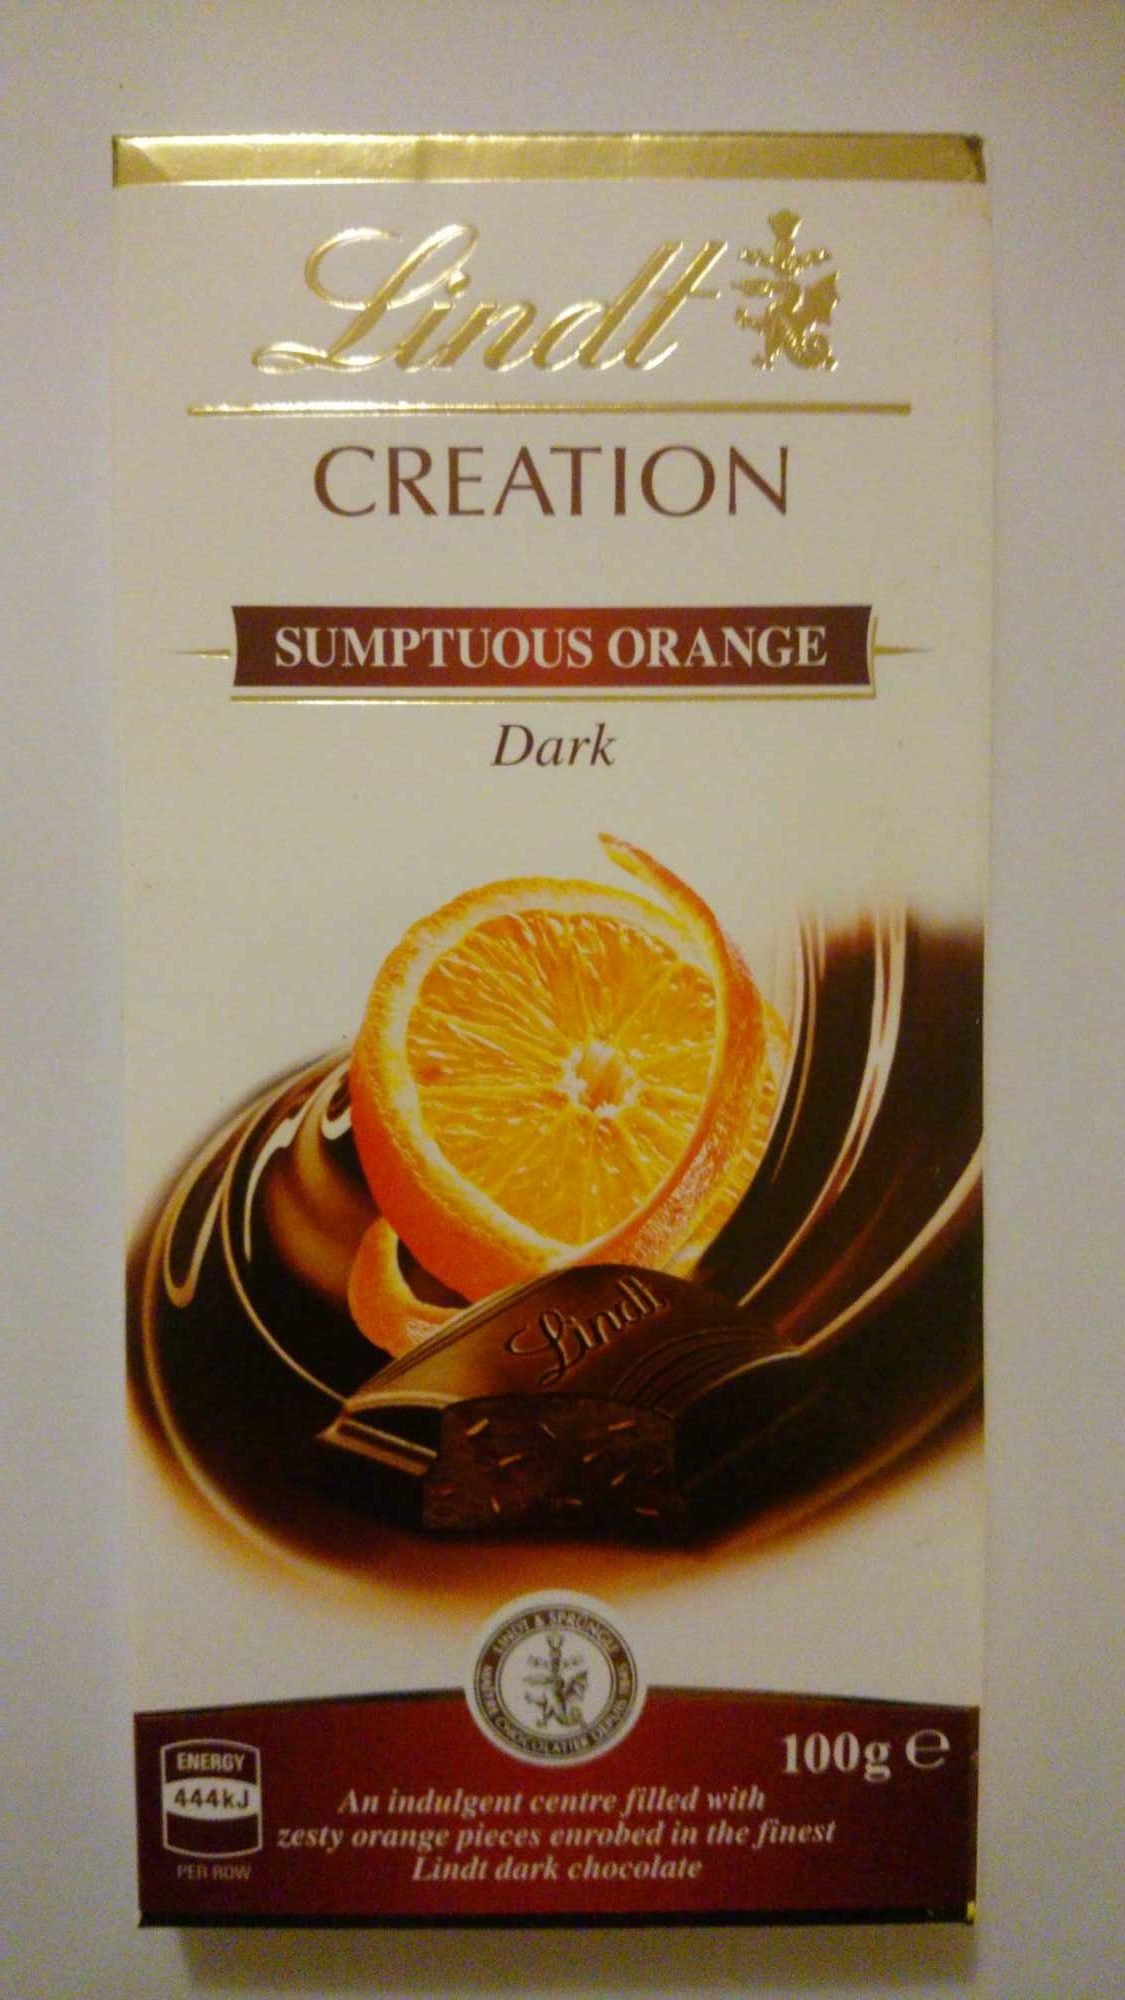 Xocolata Negra Creation Tòfona I Taronja Lindt - Product